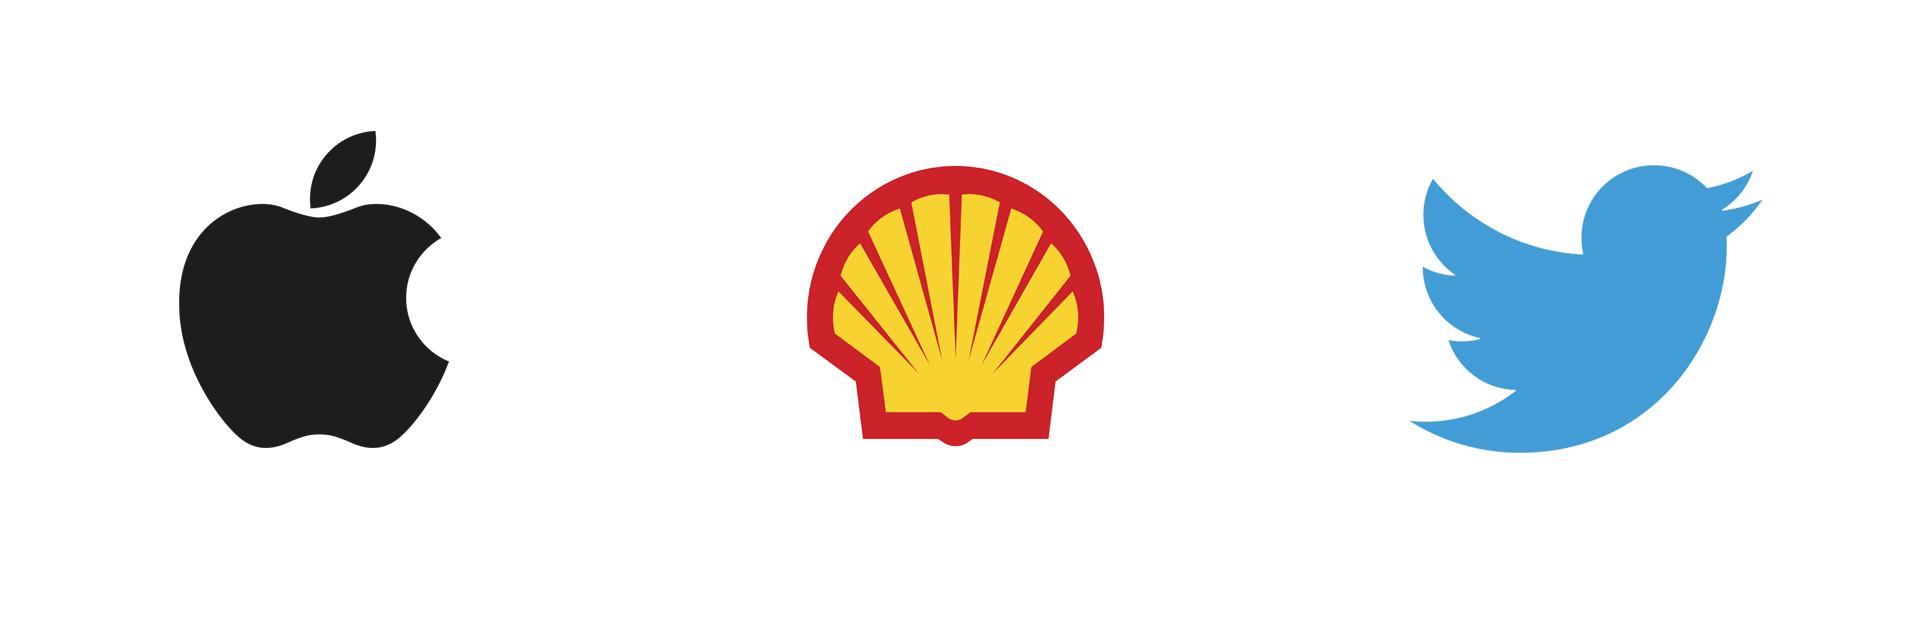 Symbolic Logotype or Logomark, Apple, Shell, Twitter